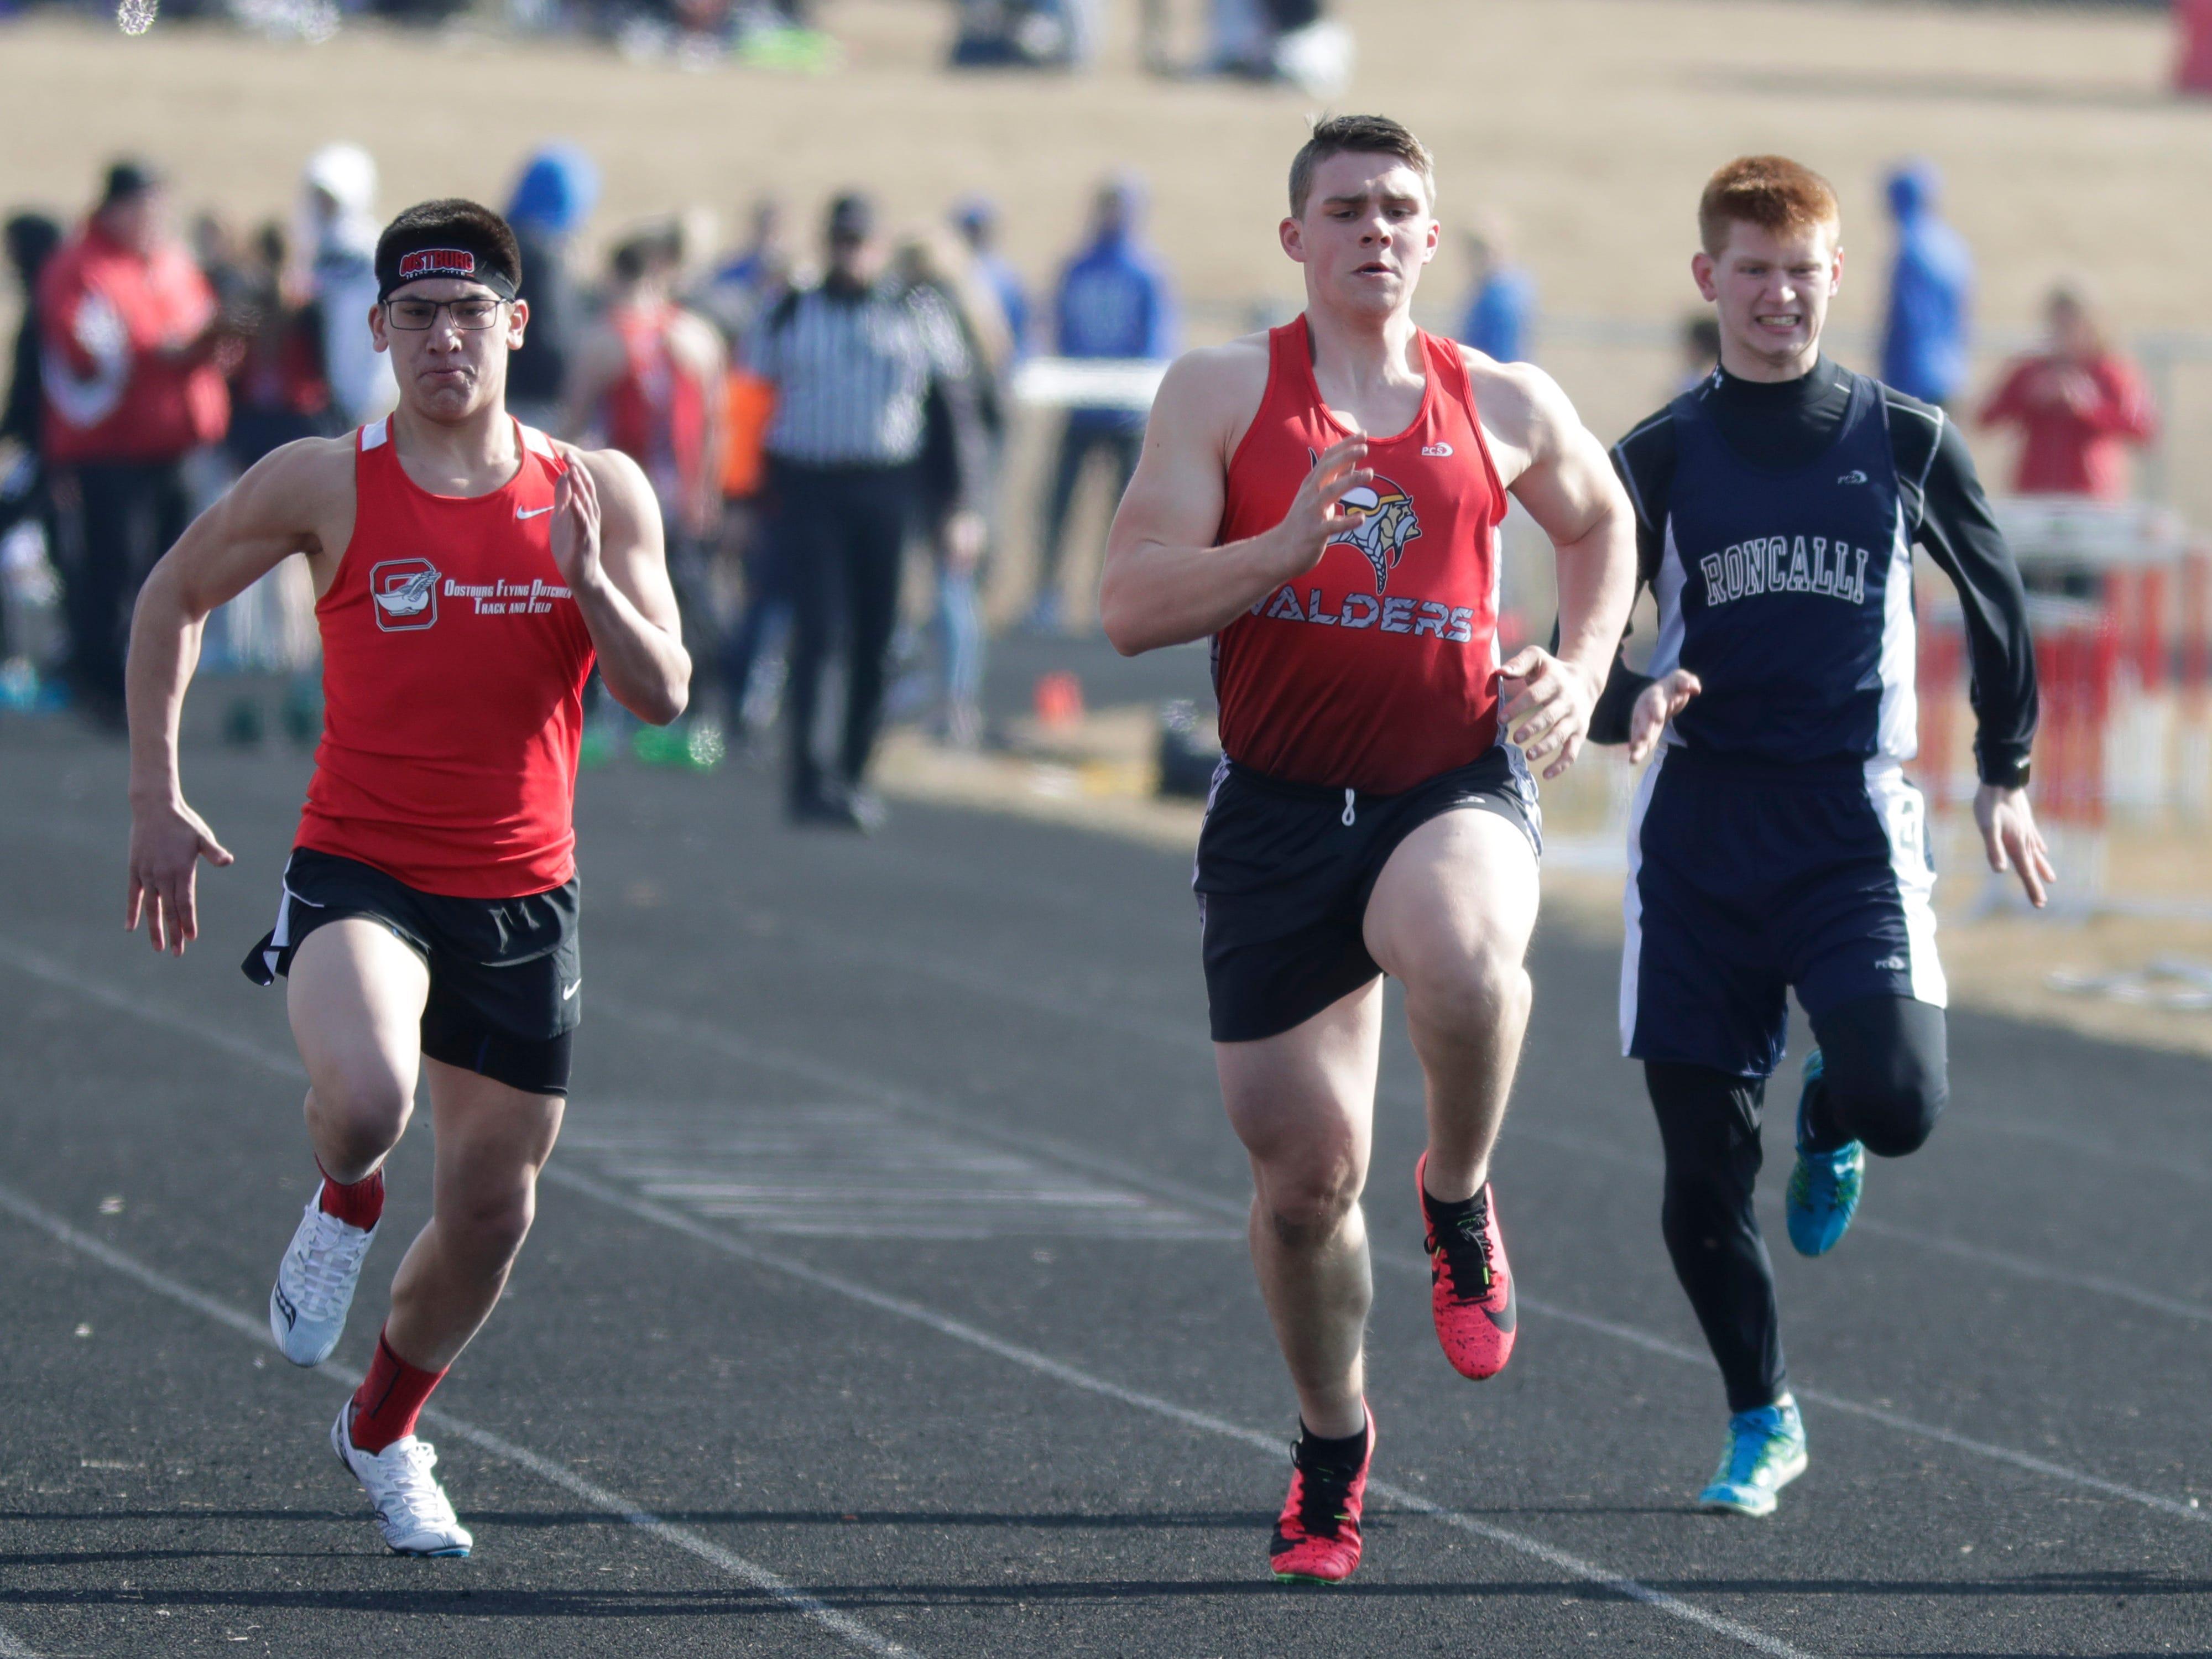 Oostburg's Ethan Wittenben, left, Valders' Andrew Welch and Roncalli's Matt Koch compete in the 100 meter dash, Friday, April 5, 2019, in Oostburg, Wis.